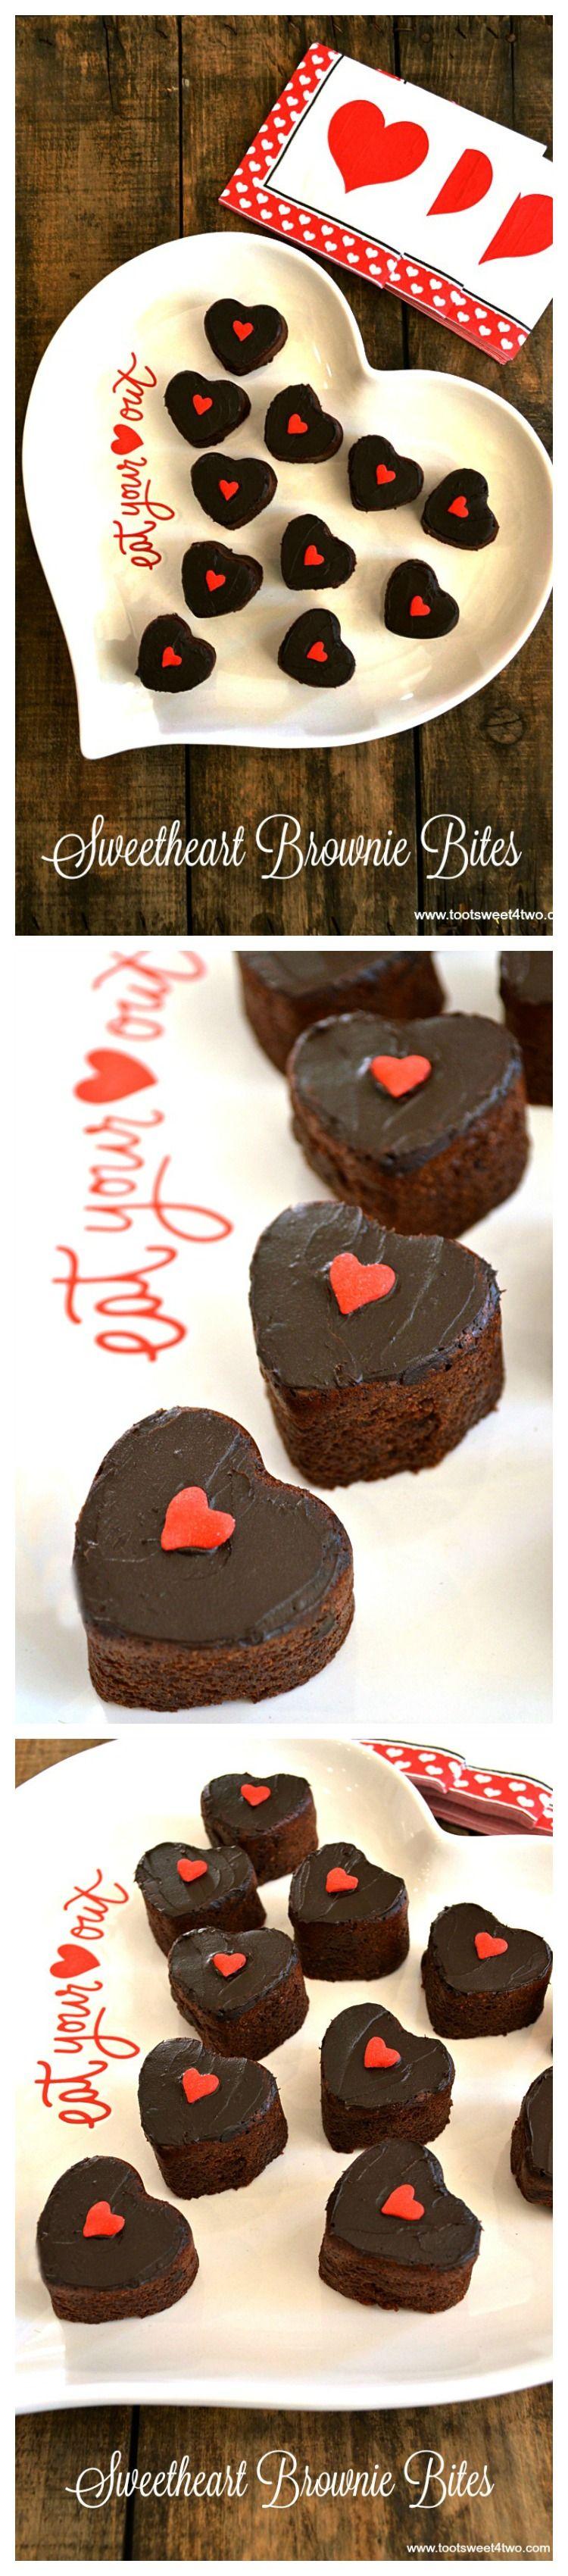 Sweetheart Brownies Bites collage